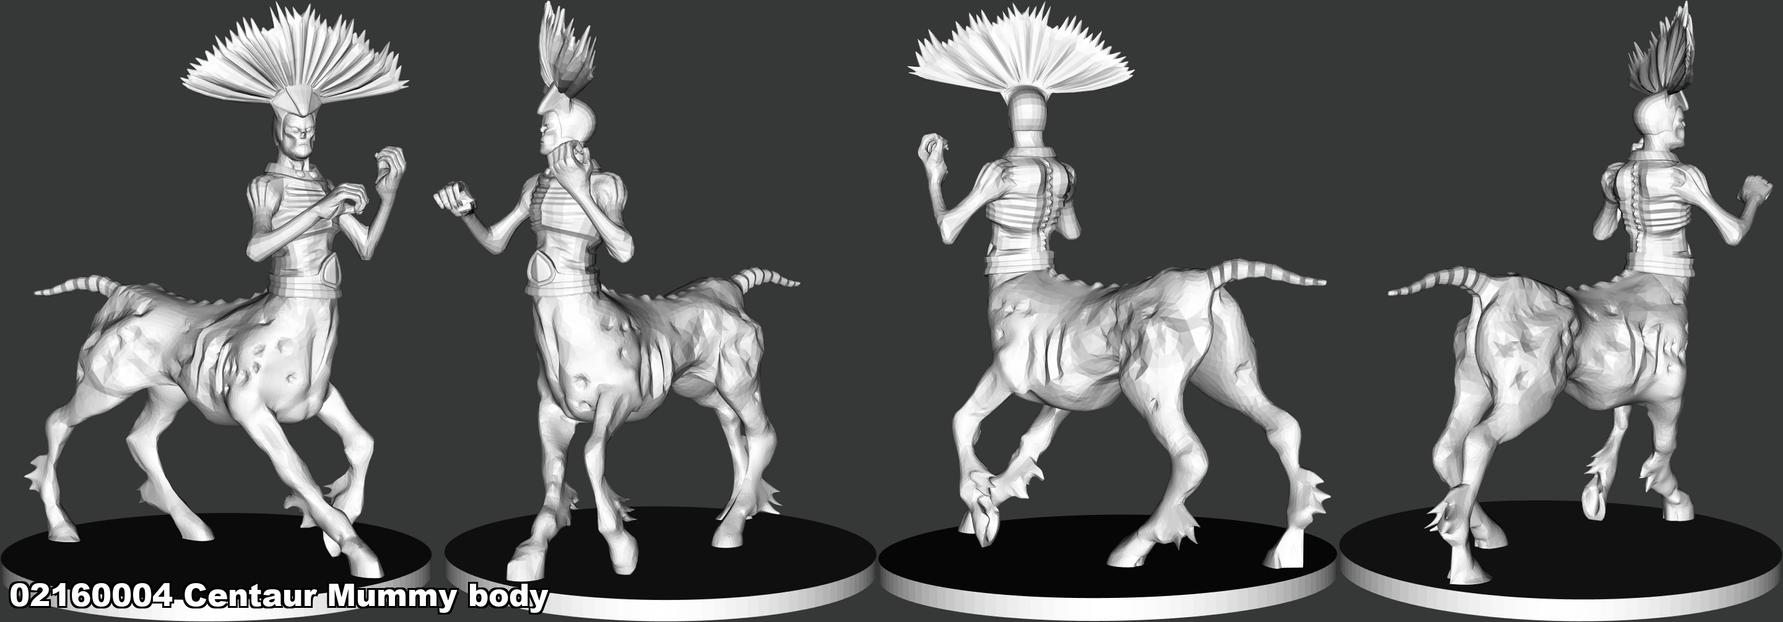 02160004 Centaur Mummy body.png